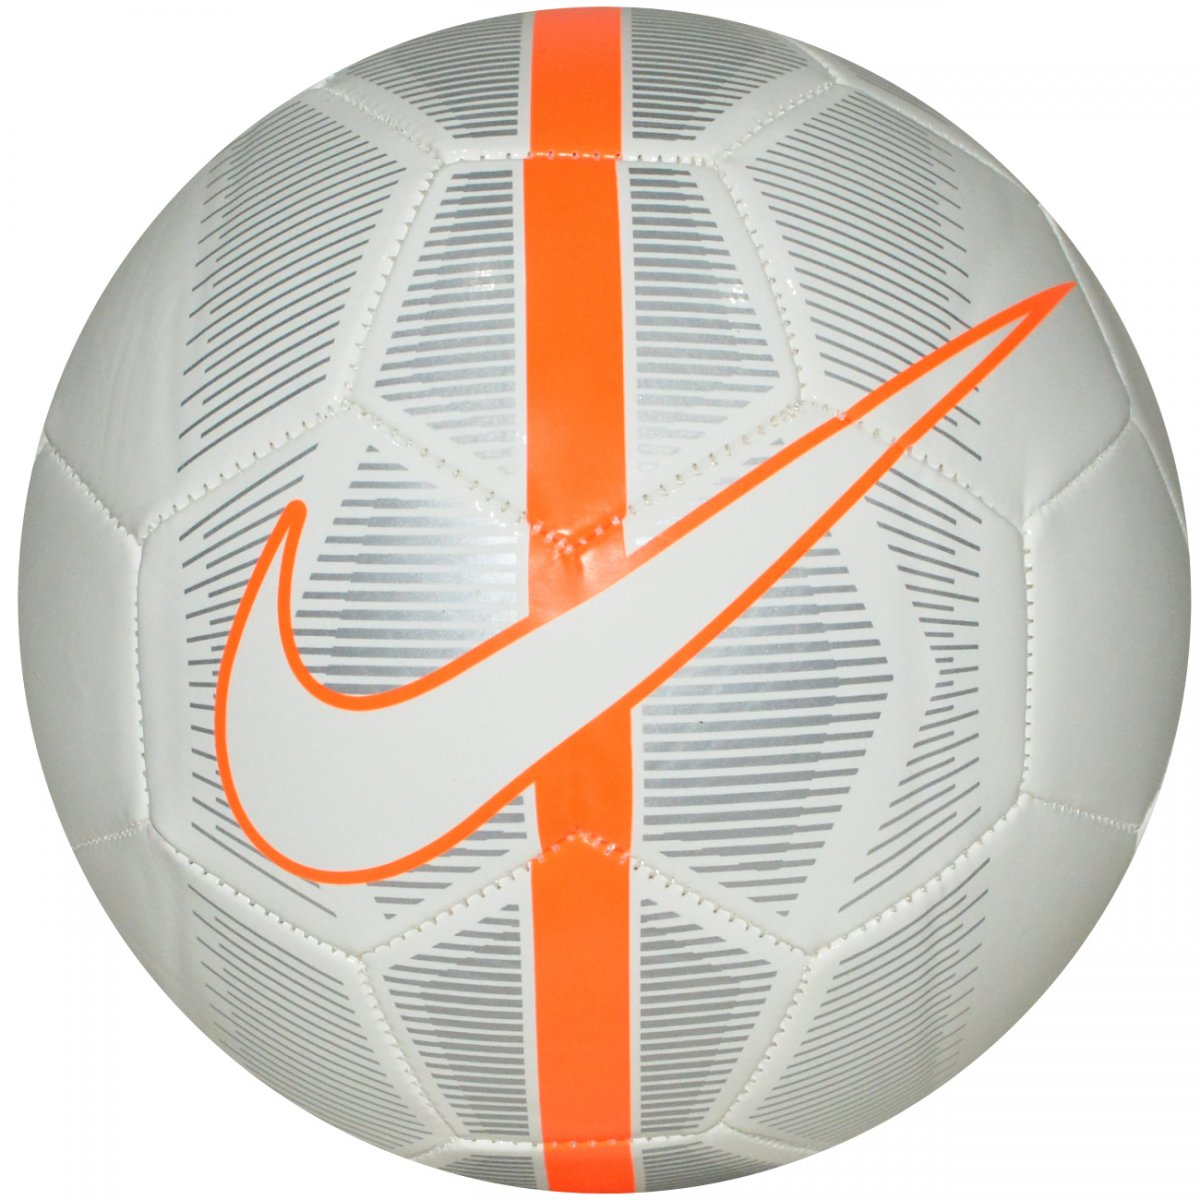 Bola Nike Mercurial Fade SC3023 - 100 - Branco prata laranja - Chuteira Nike 6b6035a2eddb6